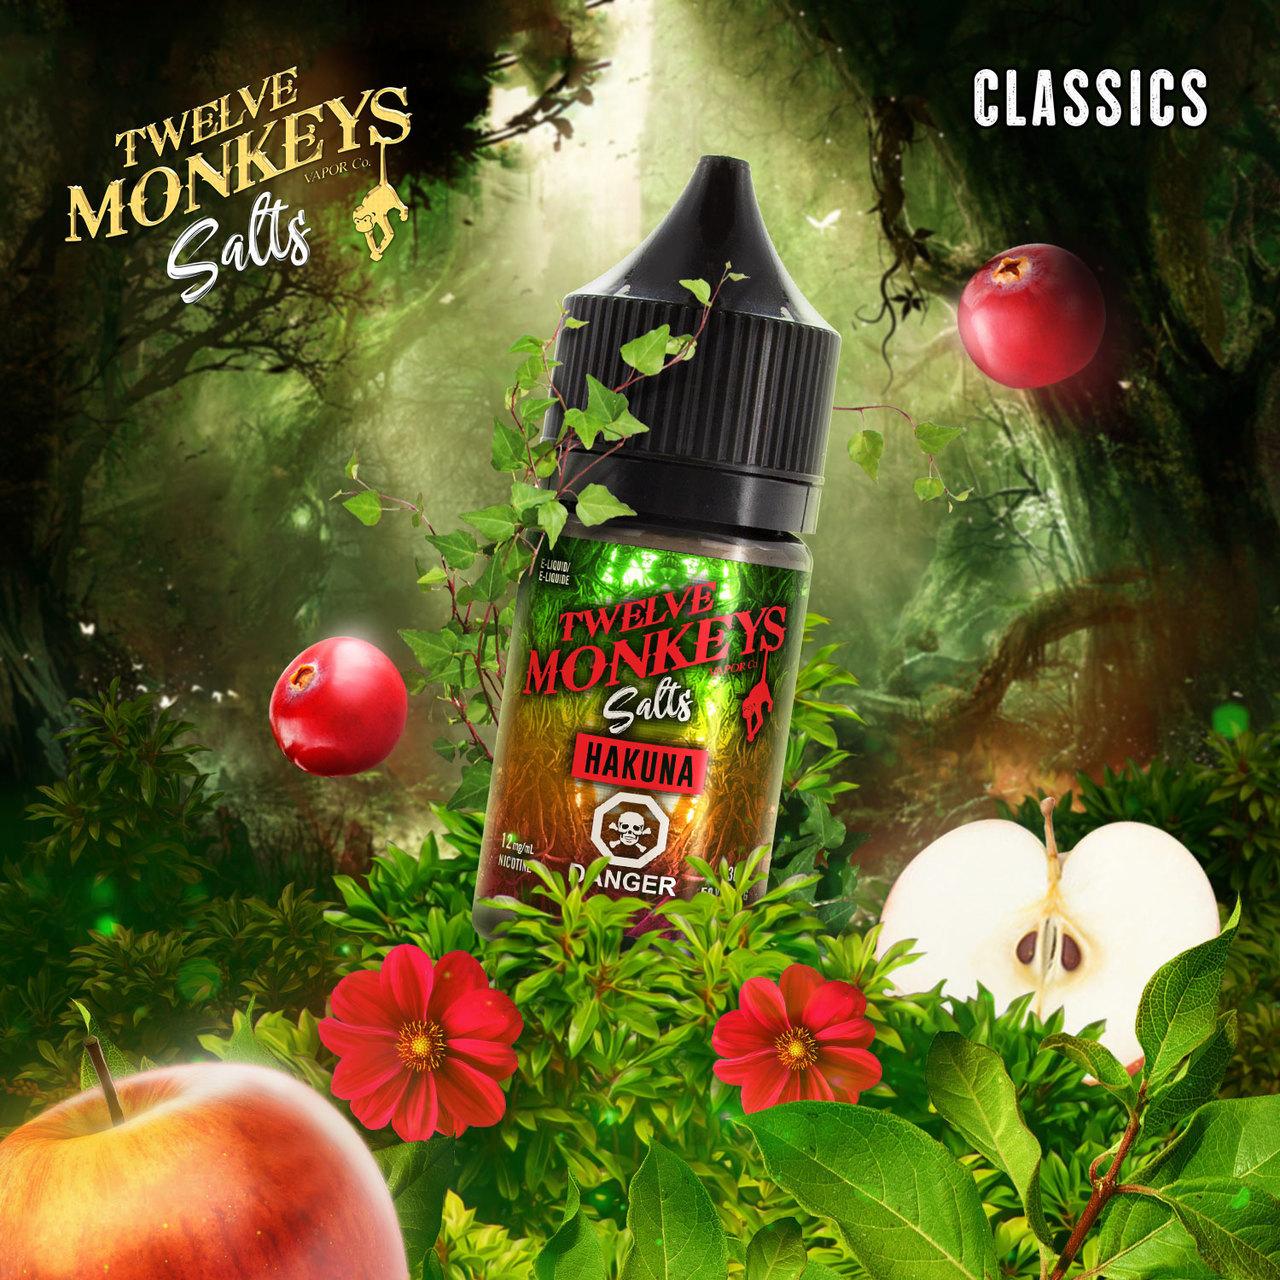 Twelve Monkeys Salts- Hakuna (30mL) 12mg